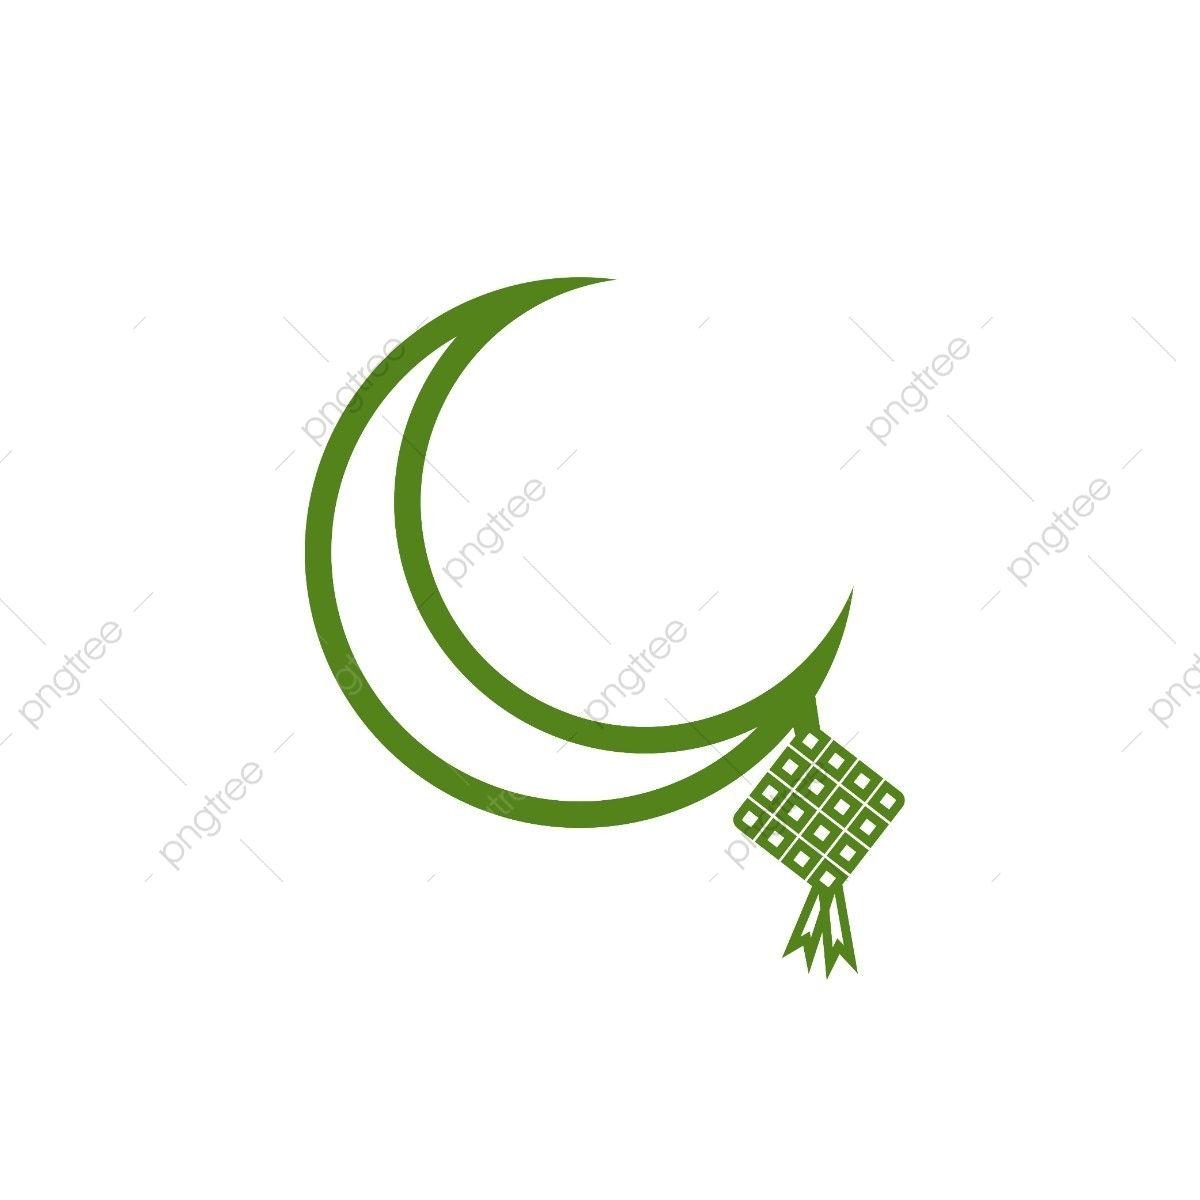 Ketupat Eid Al Fitr Ramadan Illustration Icon Ketupat Islamic Ramadan Png And Vector With Transparent Background For Free Download In 2021 Ramadan Png Eid Al Fitr Card Illustration